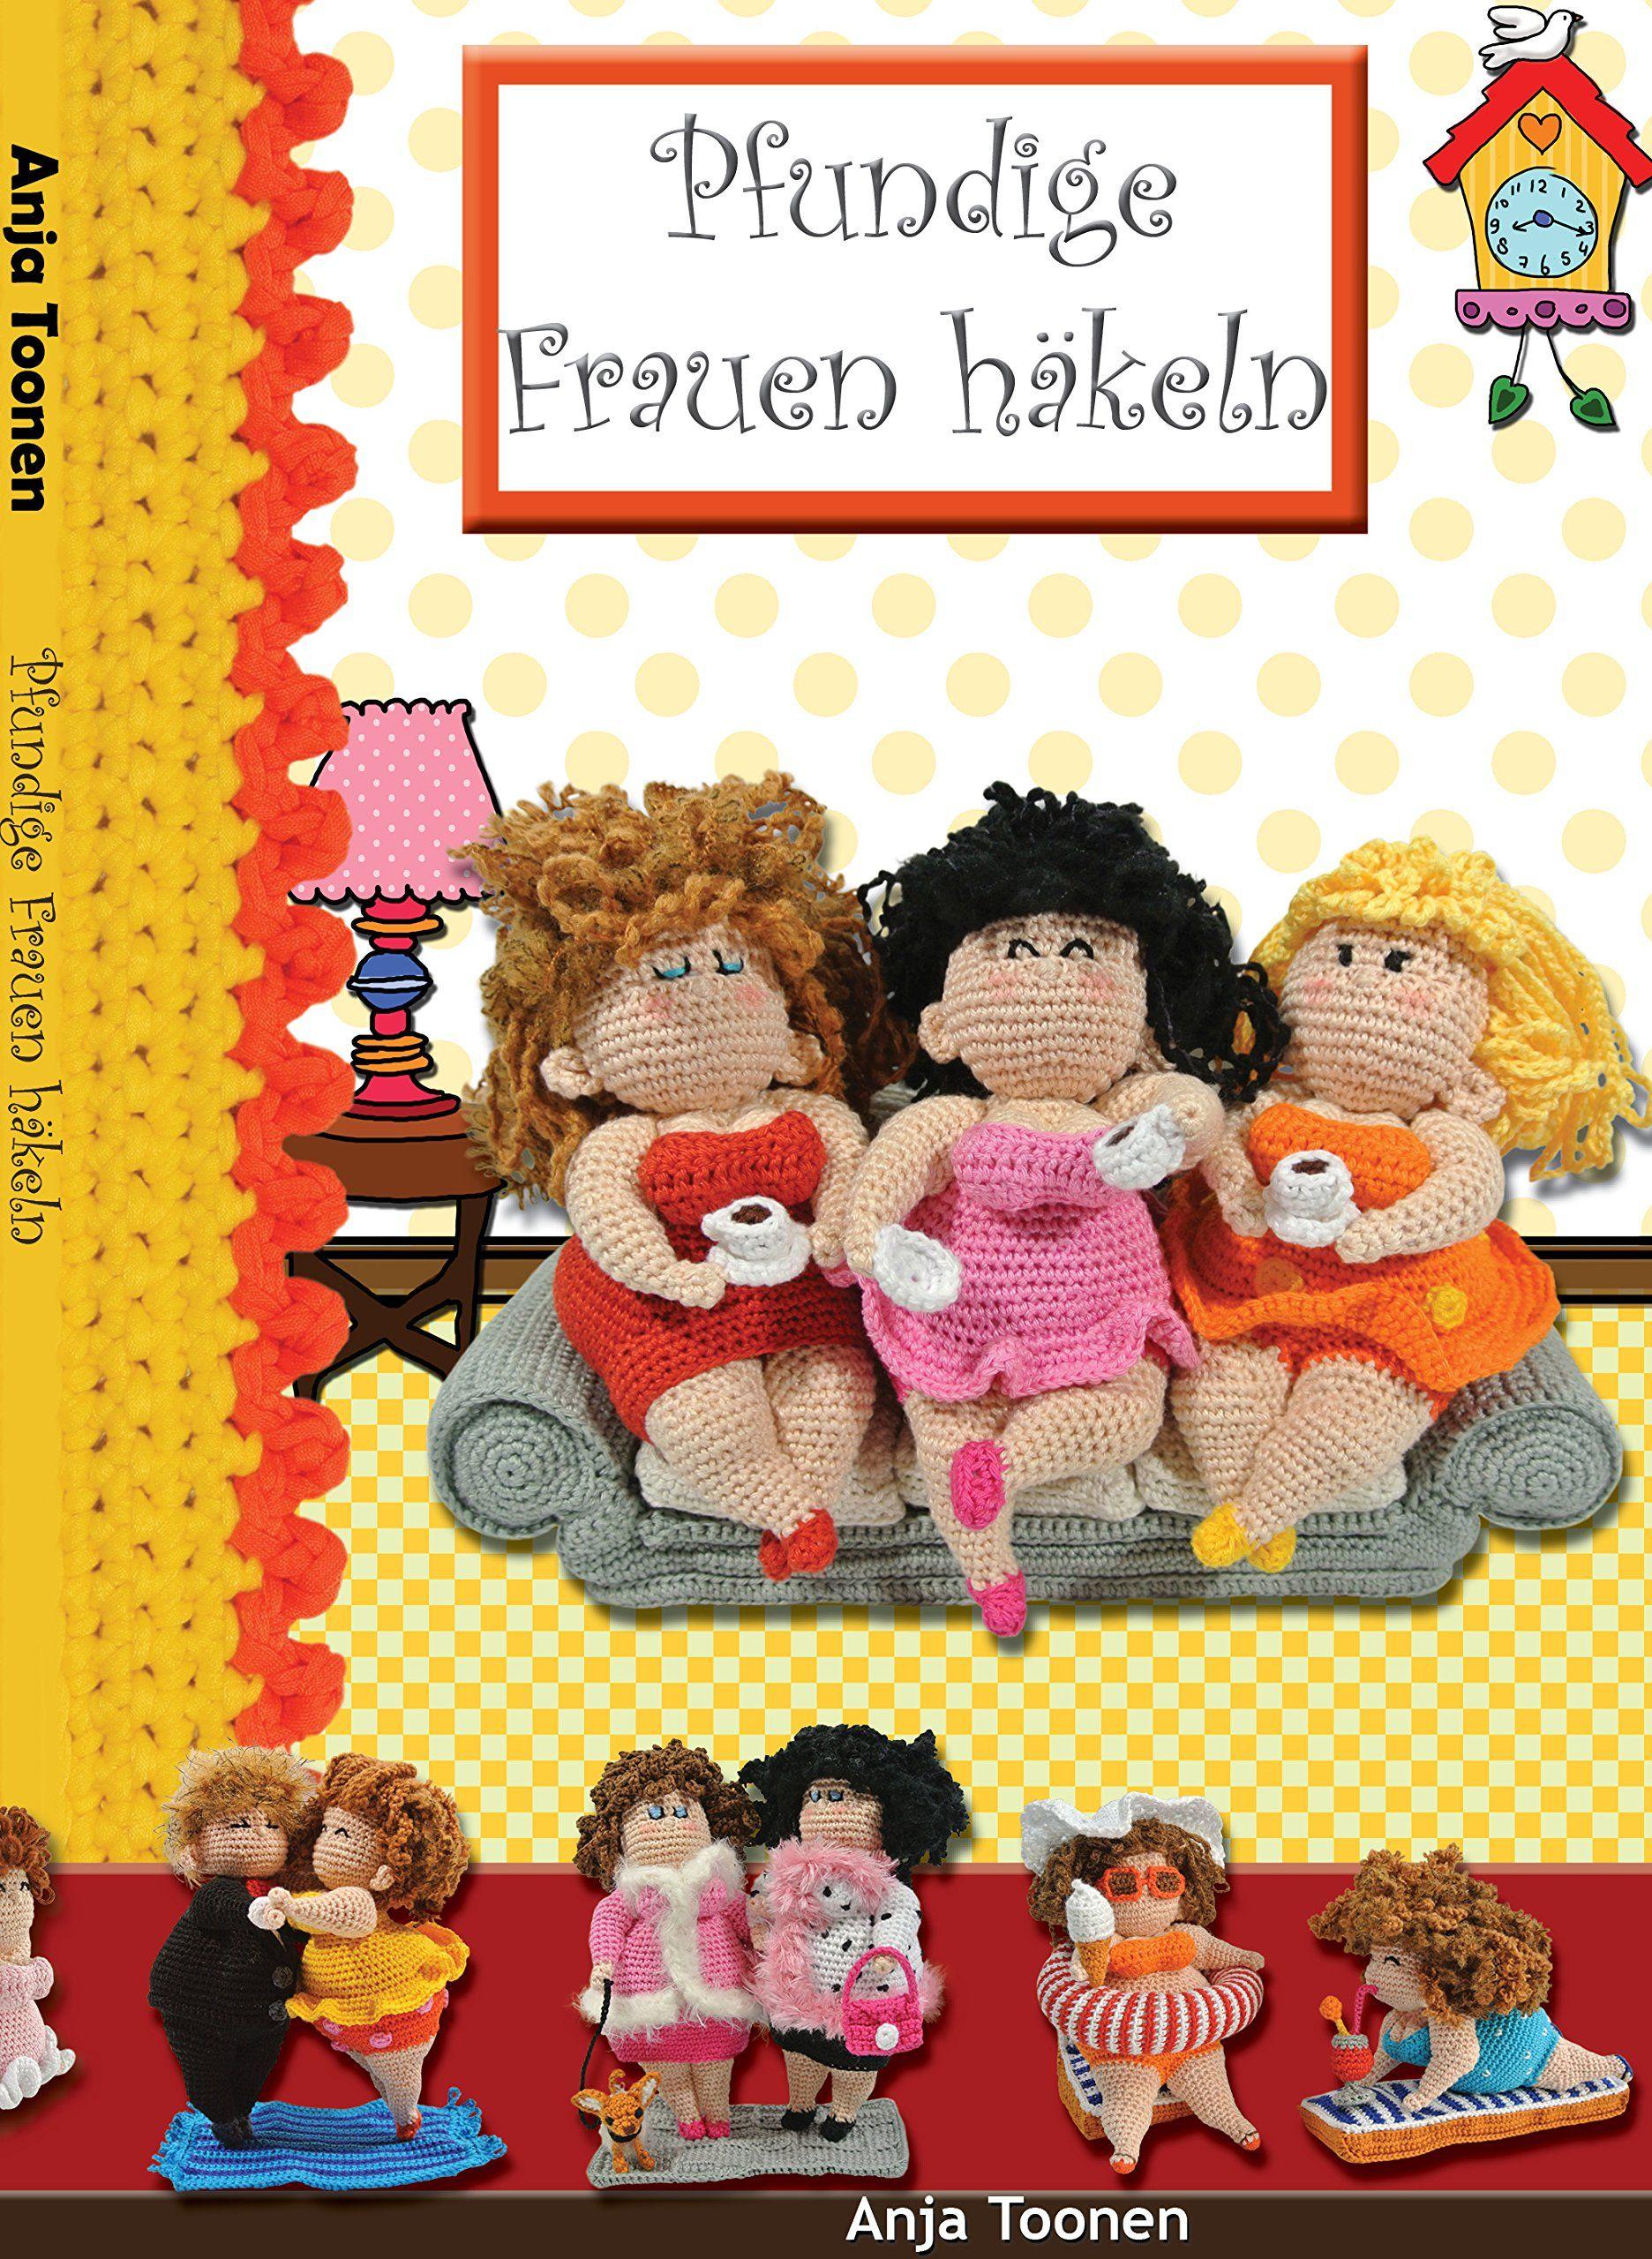 Pfundige Frauen haekeln   Вязаные игрушки   Pinterest   Frau, Häkeln ...